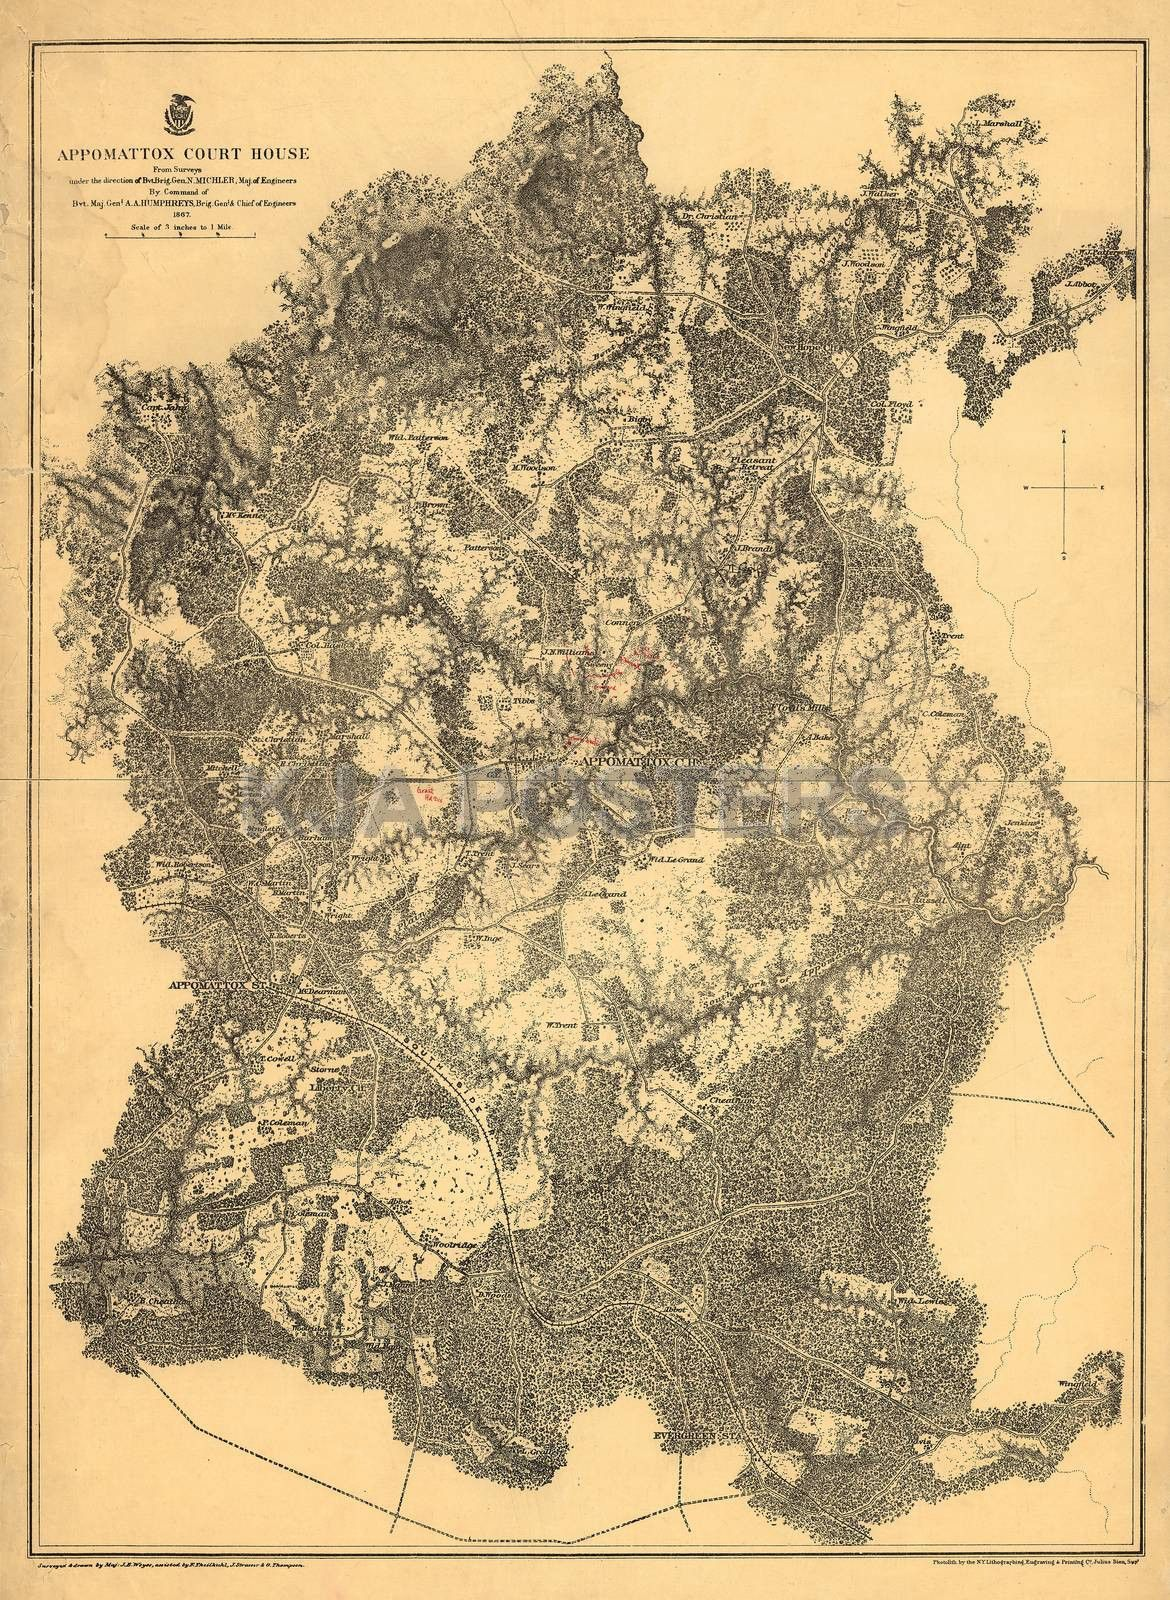 Civil War Map Appomattox Court House 1865 Products